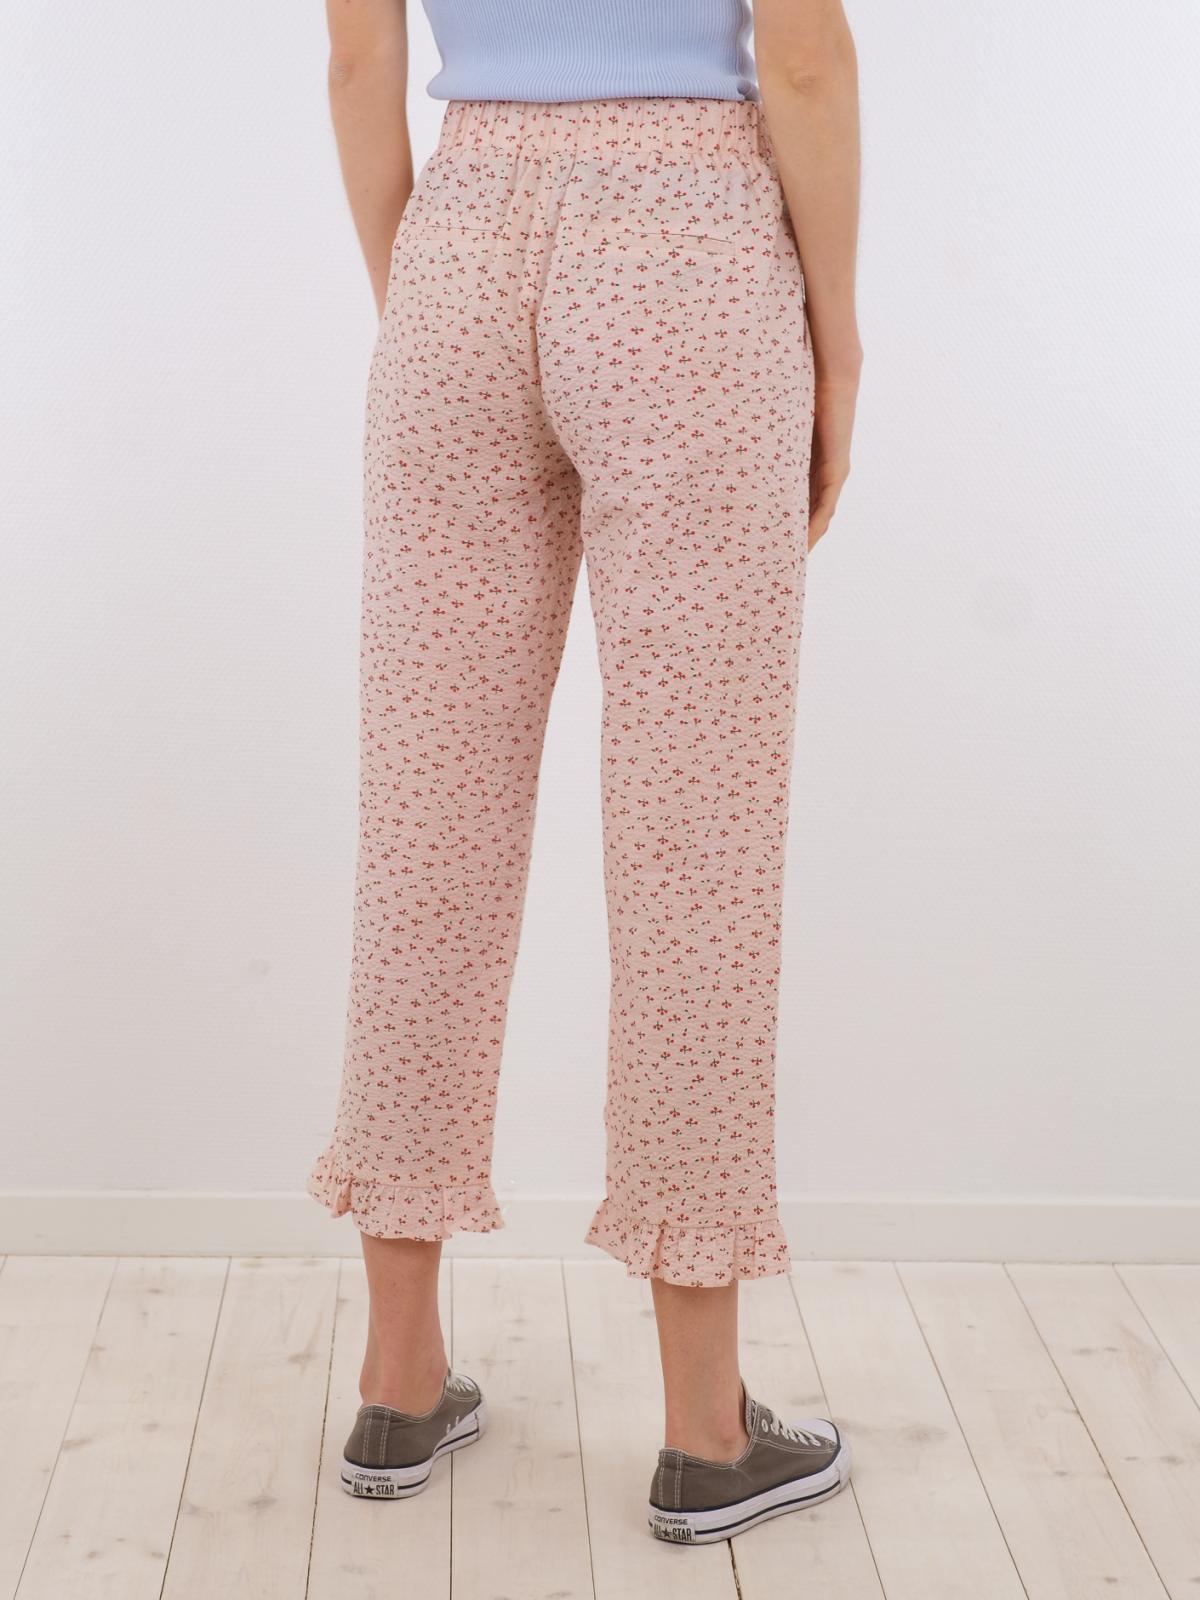 Neo Noir Ina Mini Cherry bukser, light pink, 36